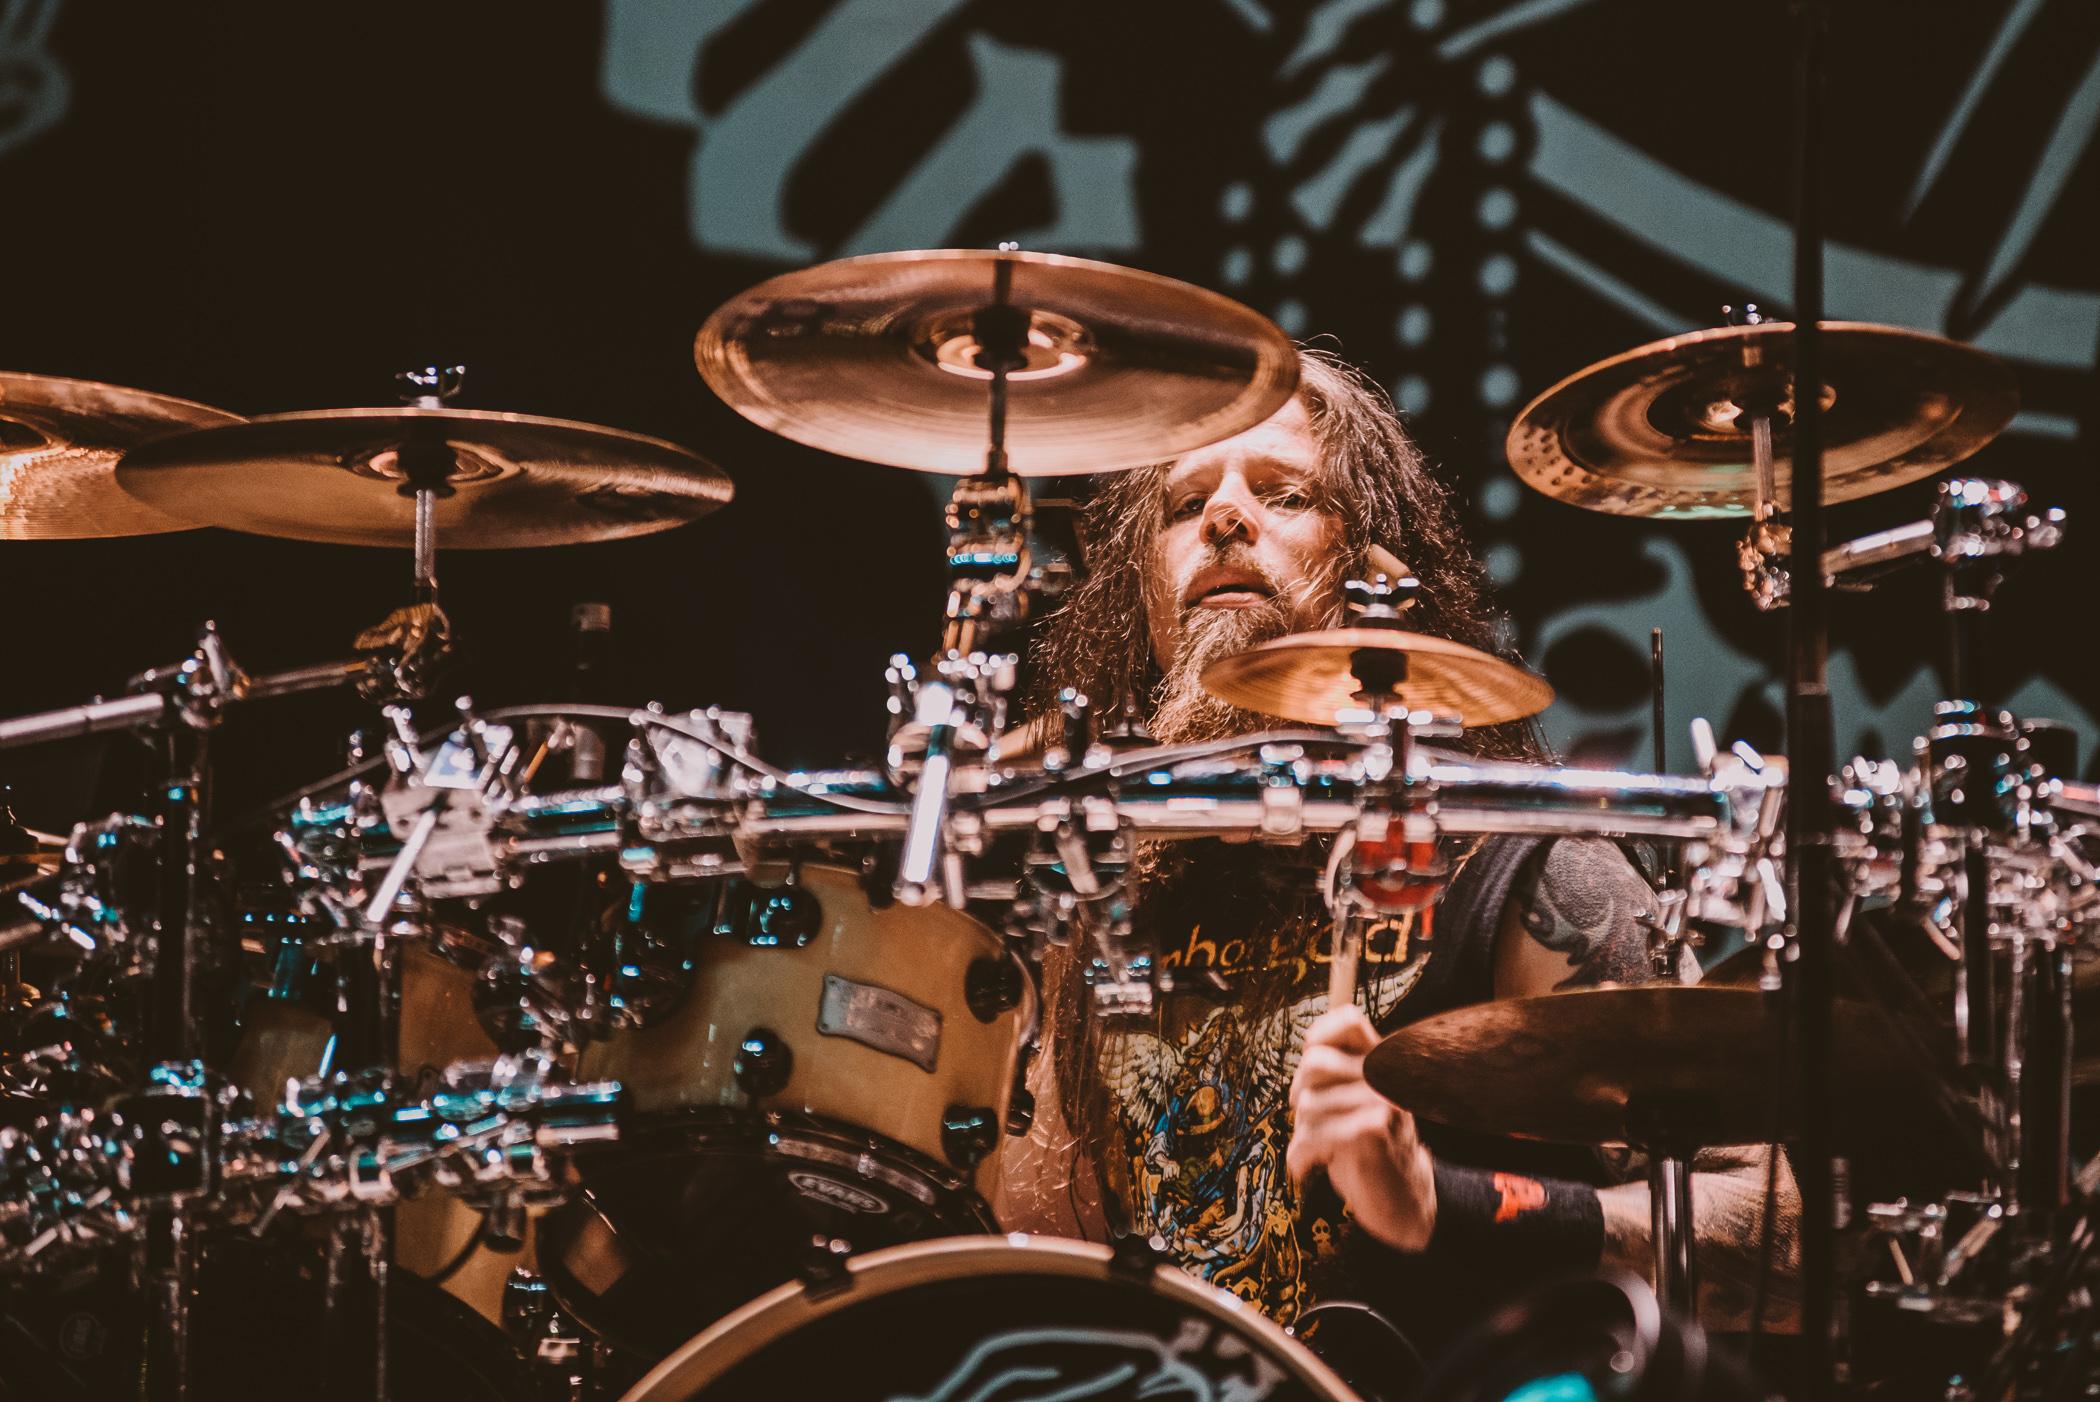 1_Lamb_Of_God-Pacific_Coliseum-Vancouver-Timothy_Nguyen-20180516 (37 of 47).jpg